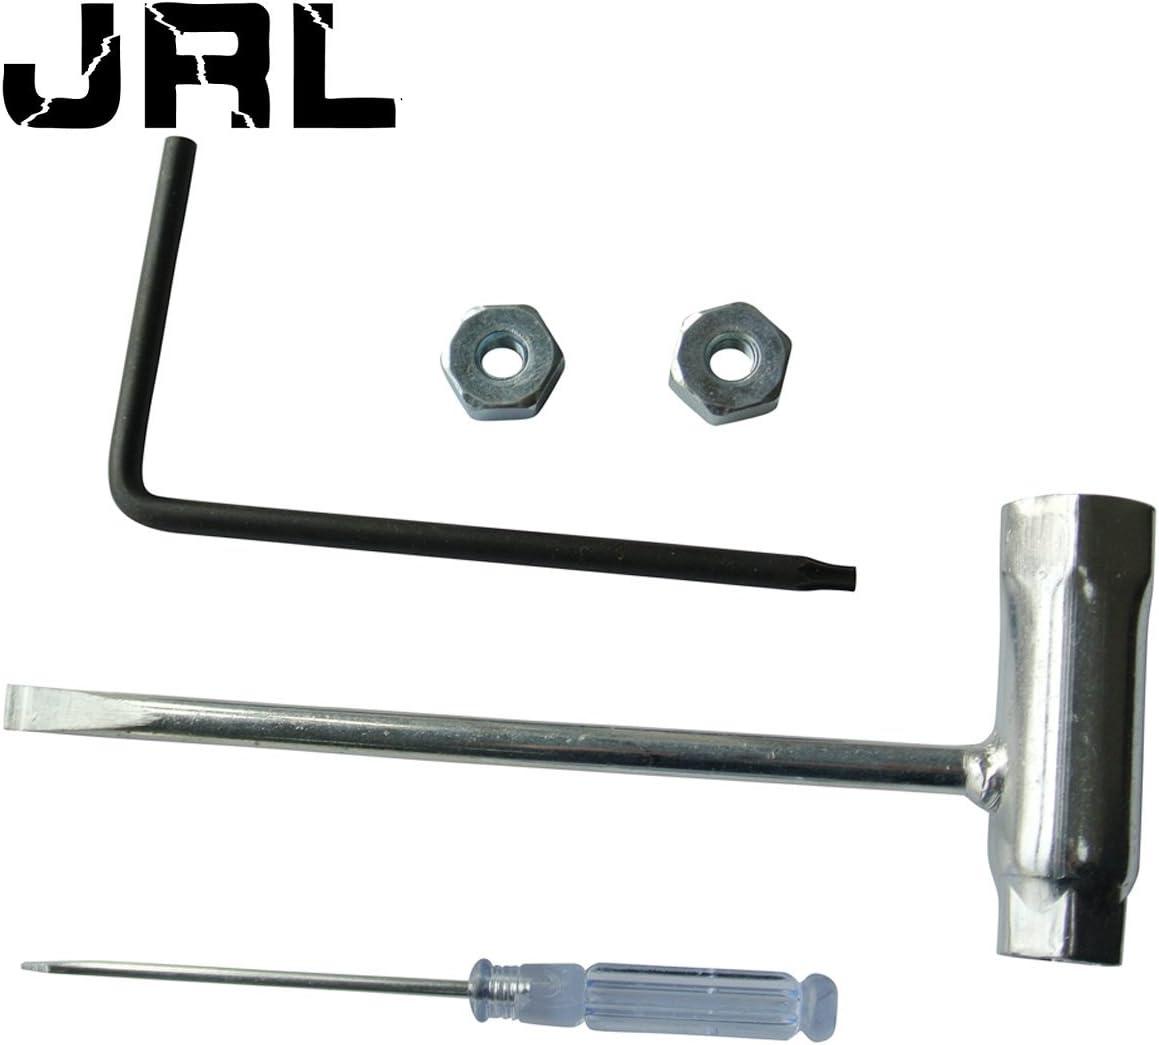 Stihl Chainsaw Carburetor Repair Adjustment Tool 5910 890 2307 Hex Head New 1PC